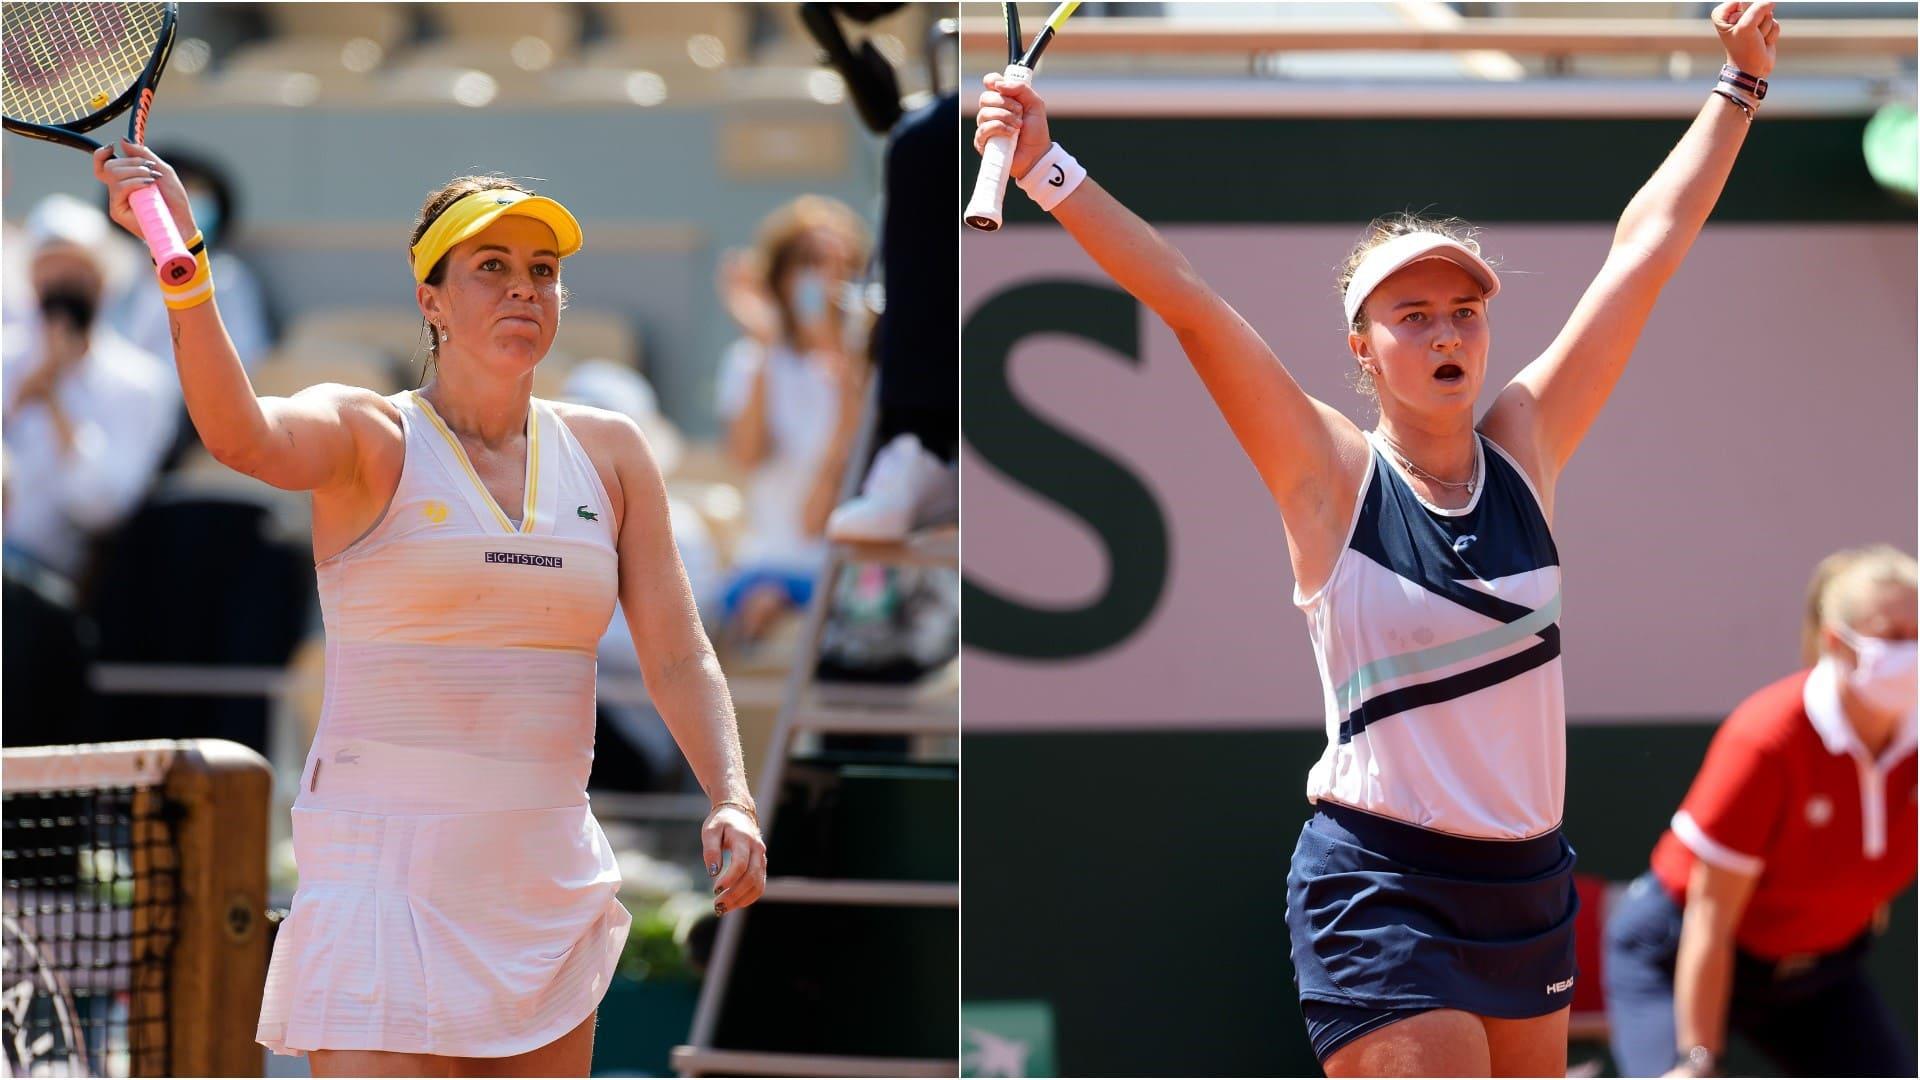 Pavlyuchenkova y Krejcikova jugarán la final femenina de Roland Garros